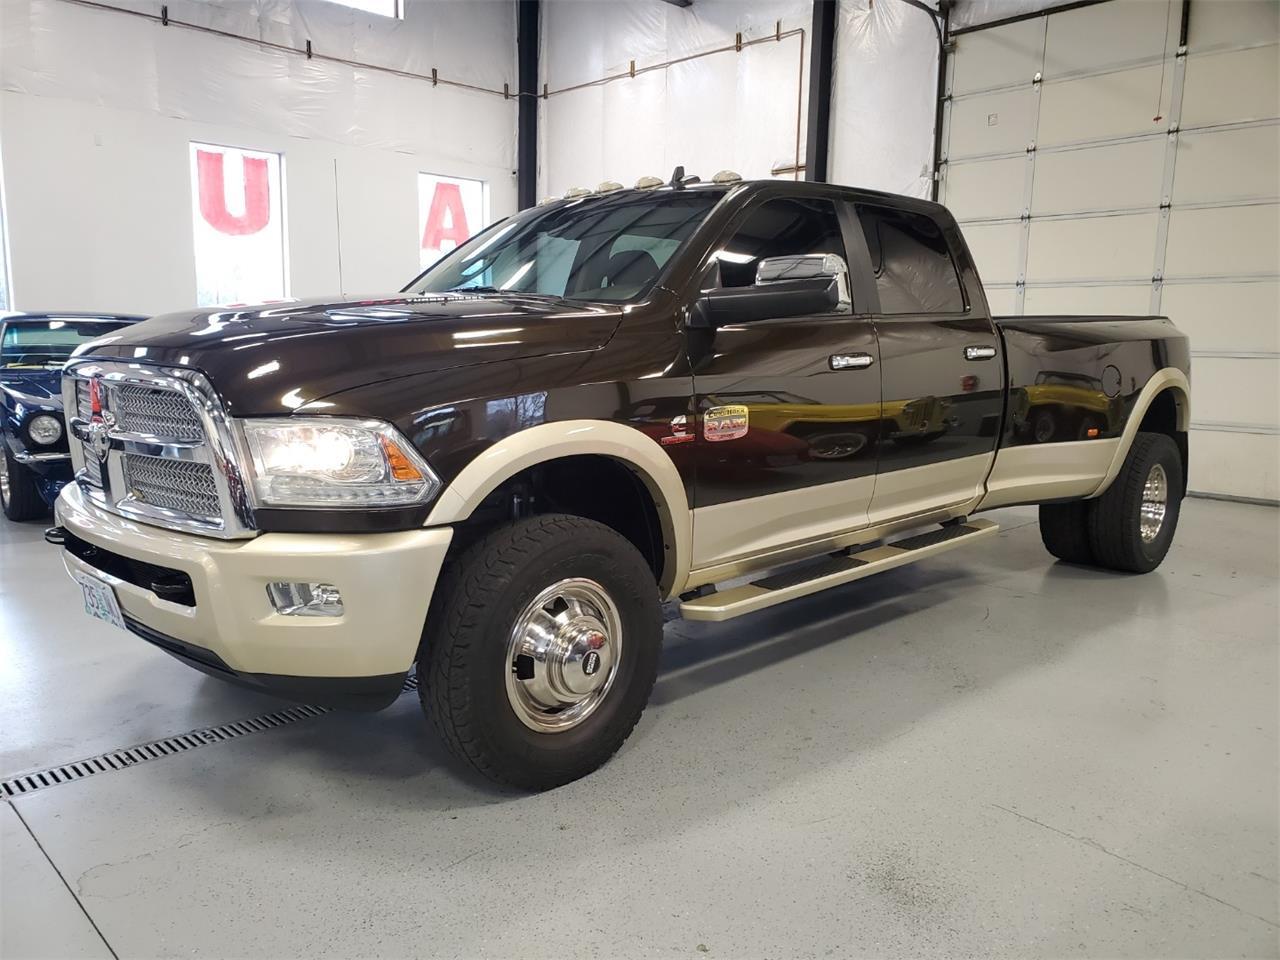 2013 Dodge Ram (CC-1422133) for sale in Bend, Oregon